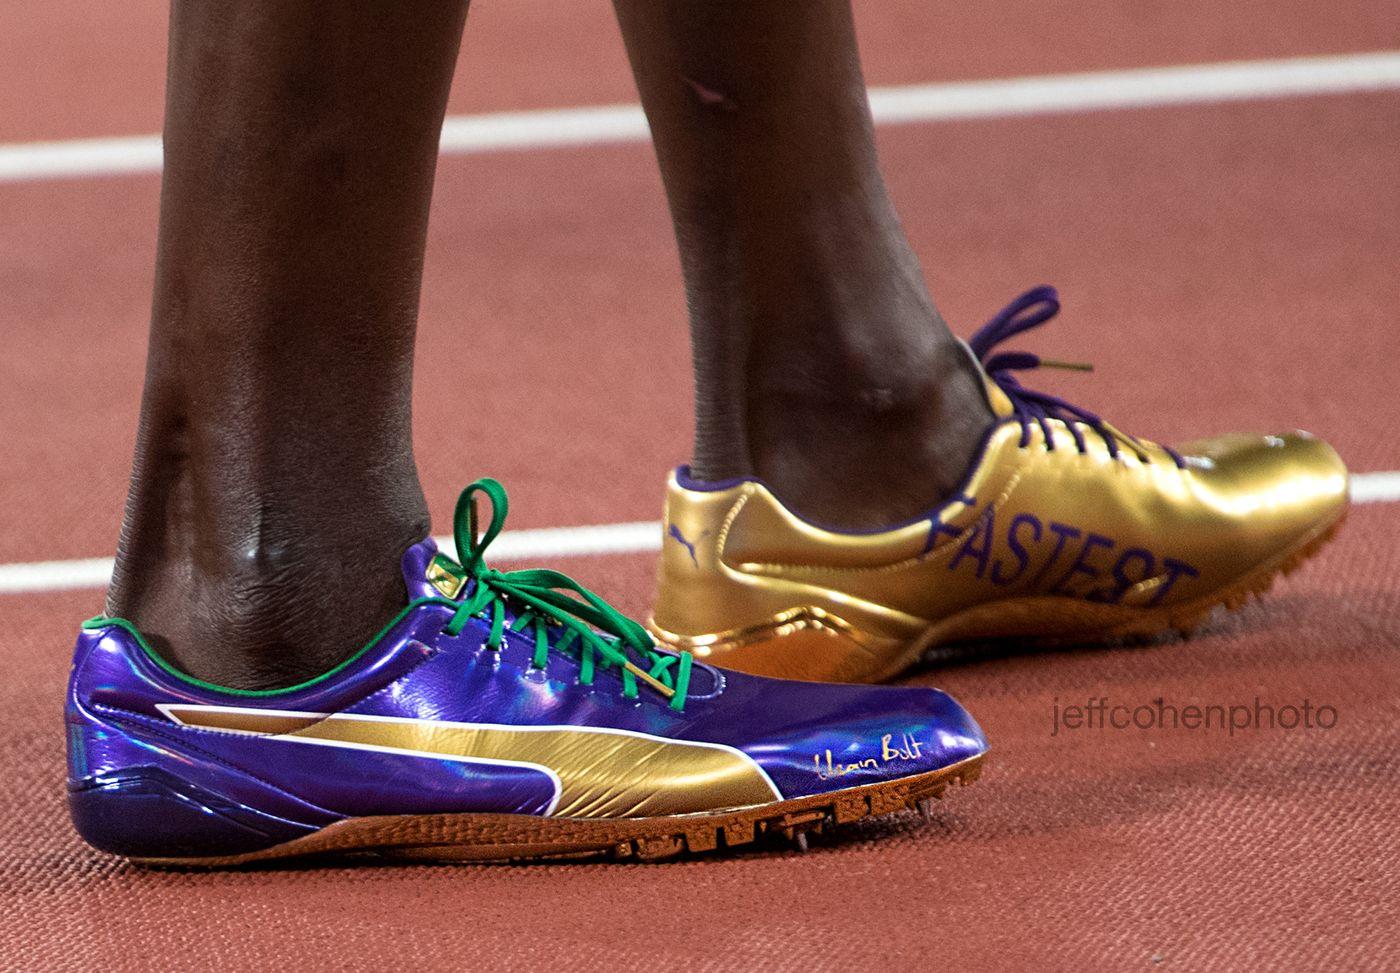 2017-IAAF-WC-London-night-9-usain-bolt-spikes-4x400--3320--jeff-cohen-photo--web.jpg